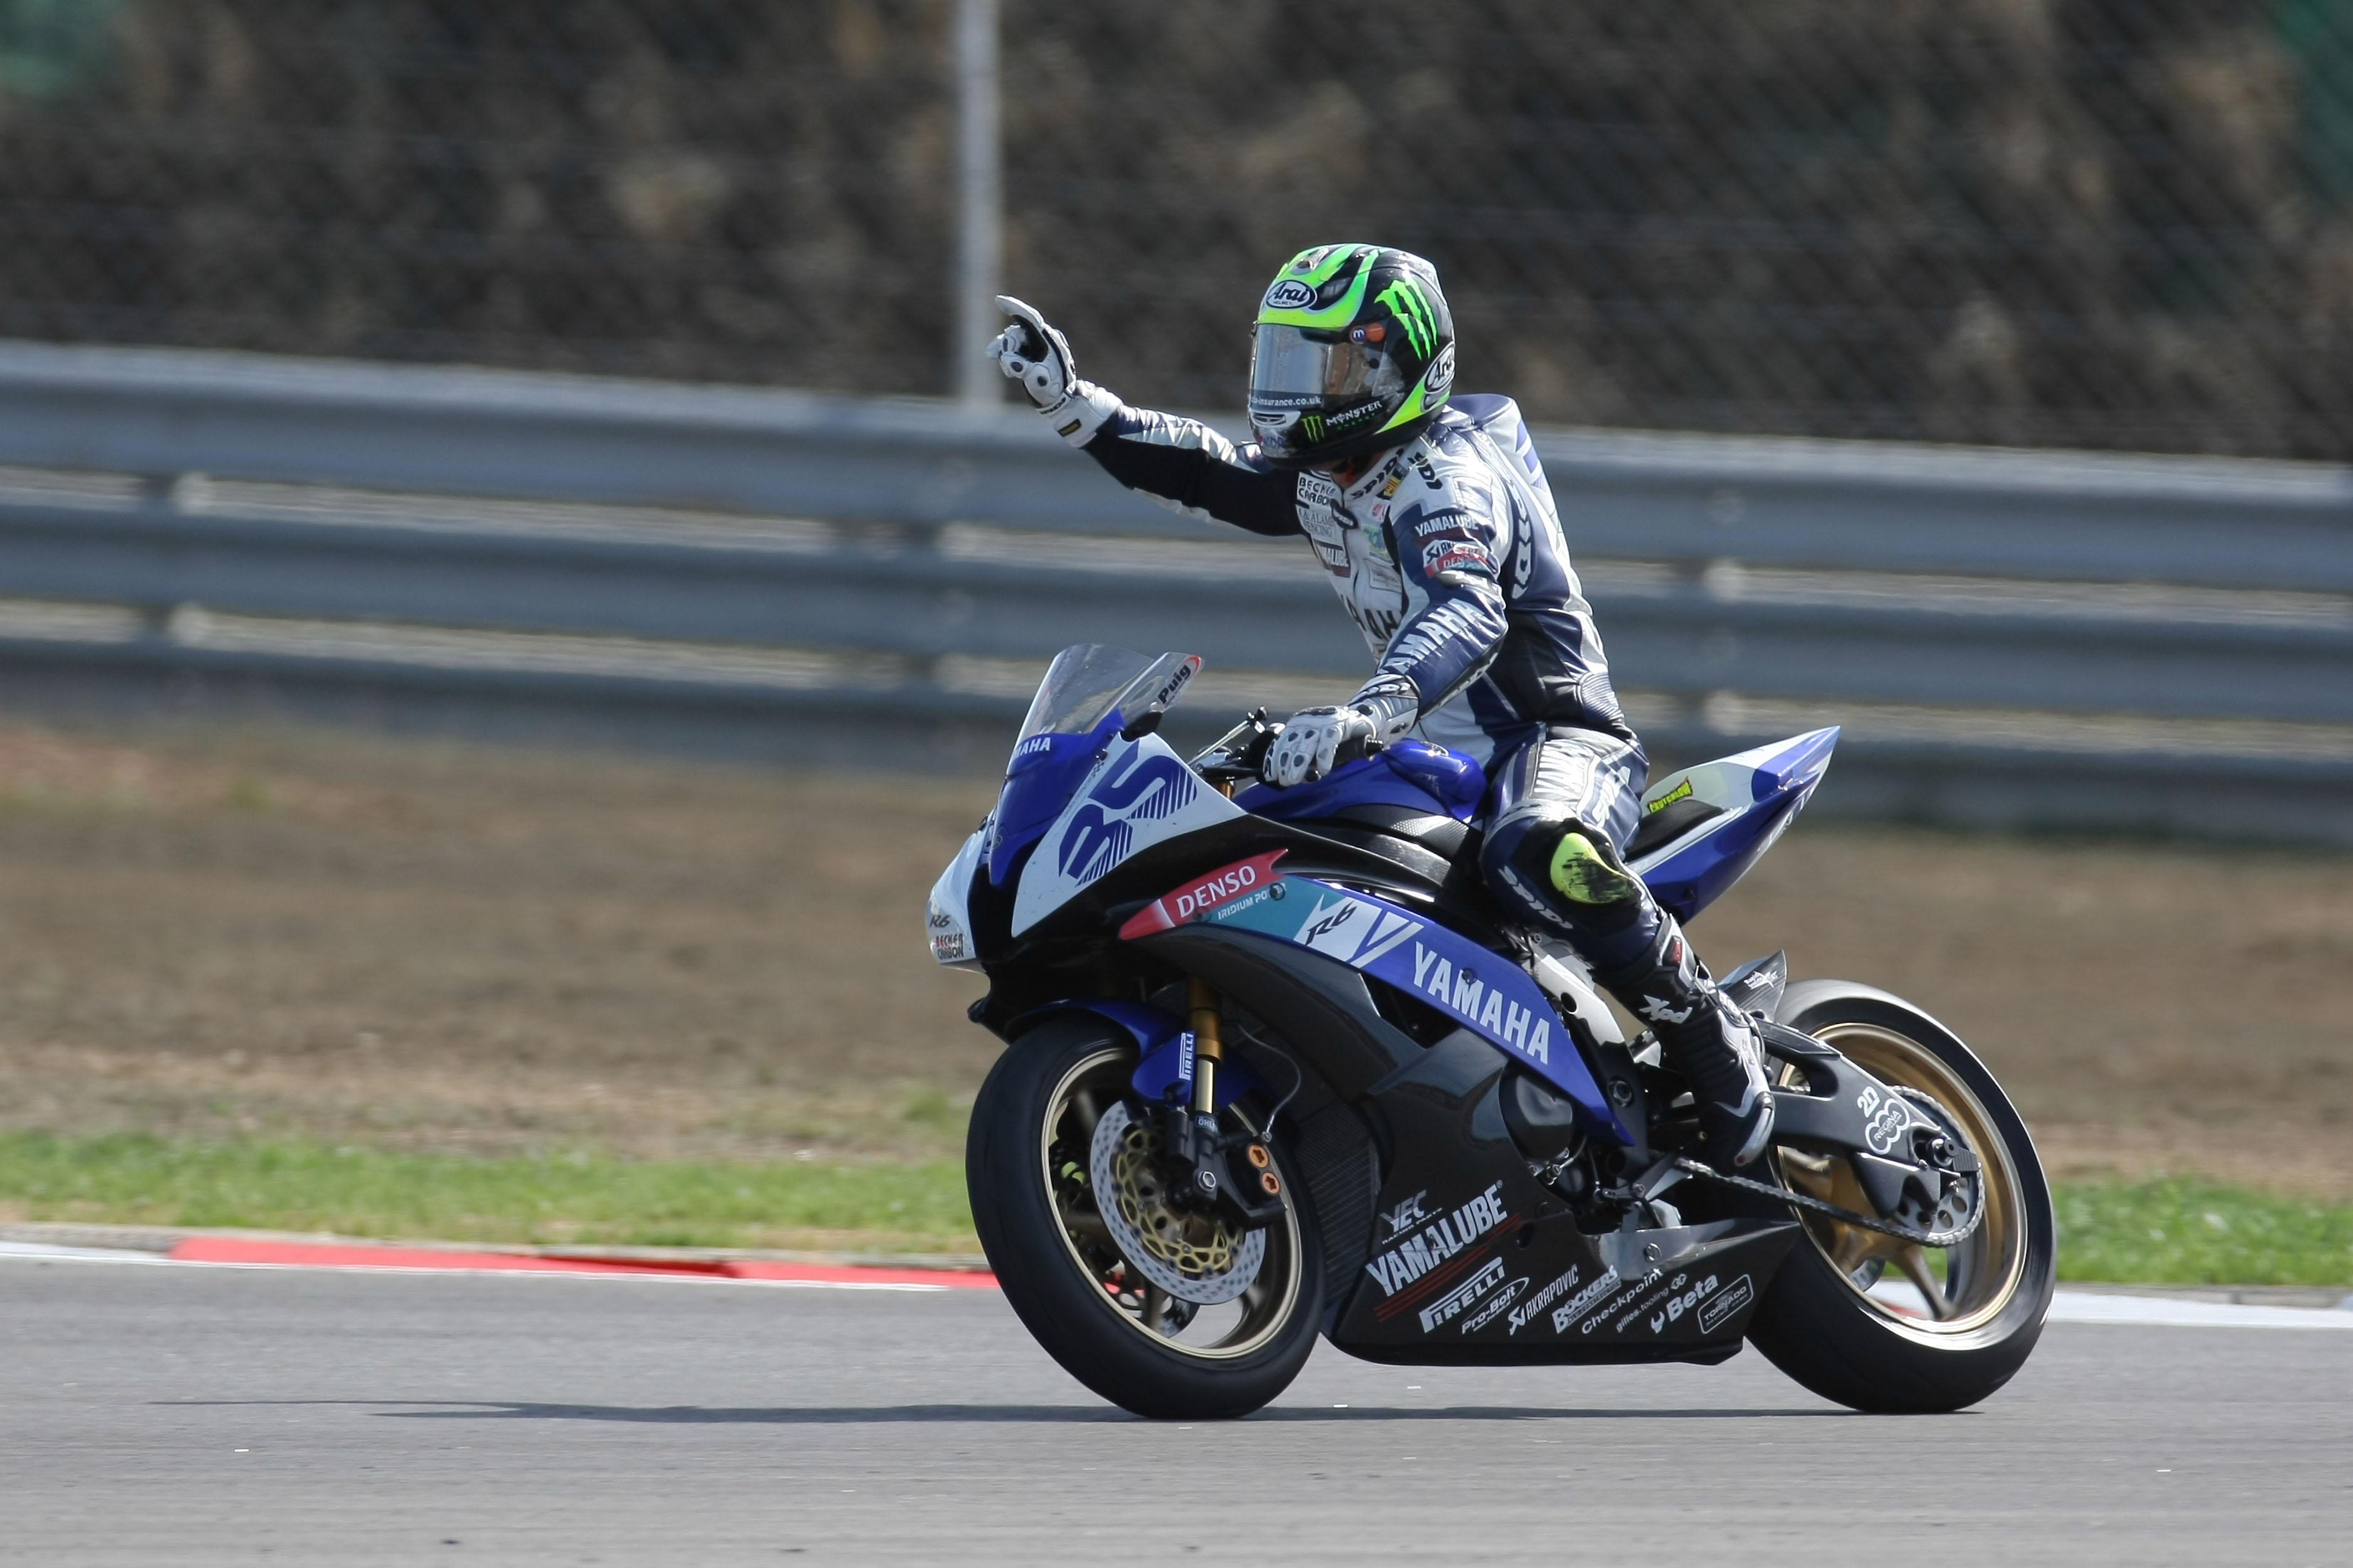 Cal Crutchlow, Yamaha, World Supersport, 2009,